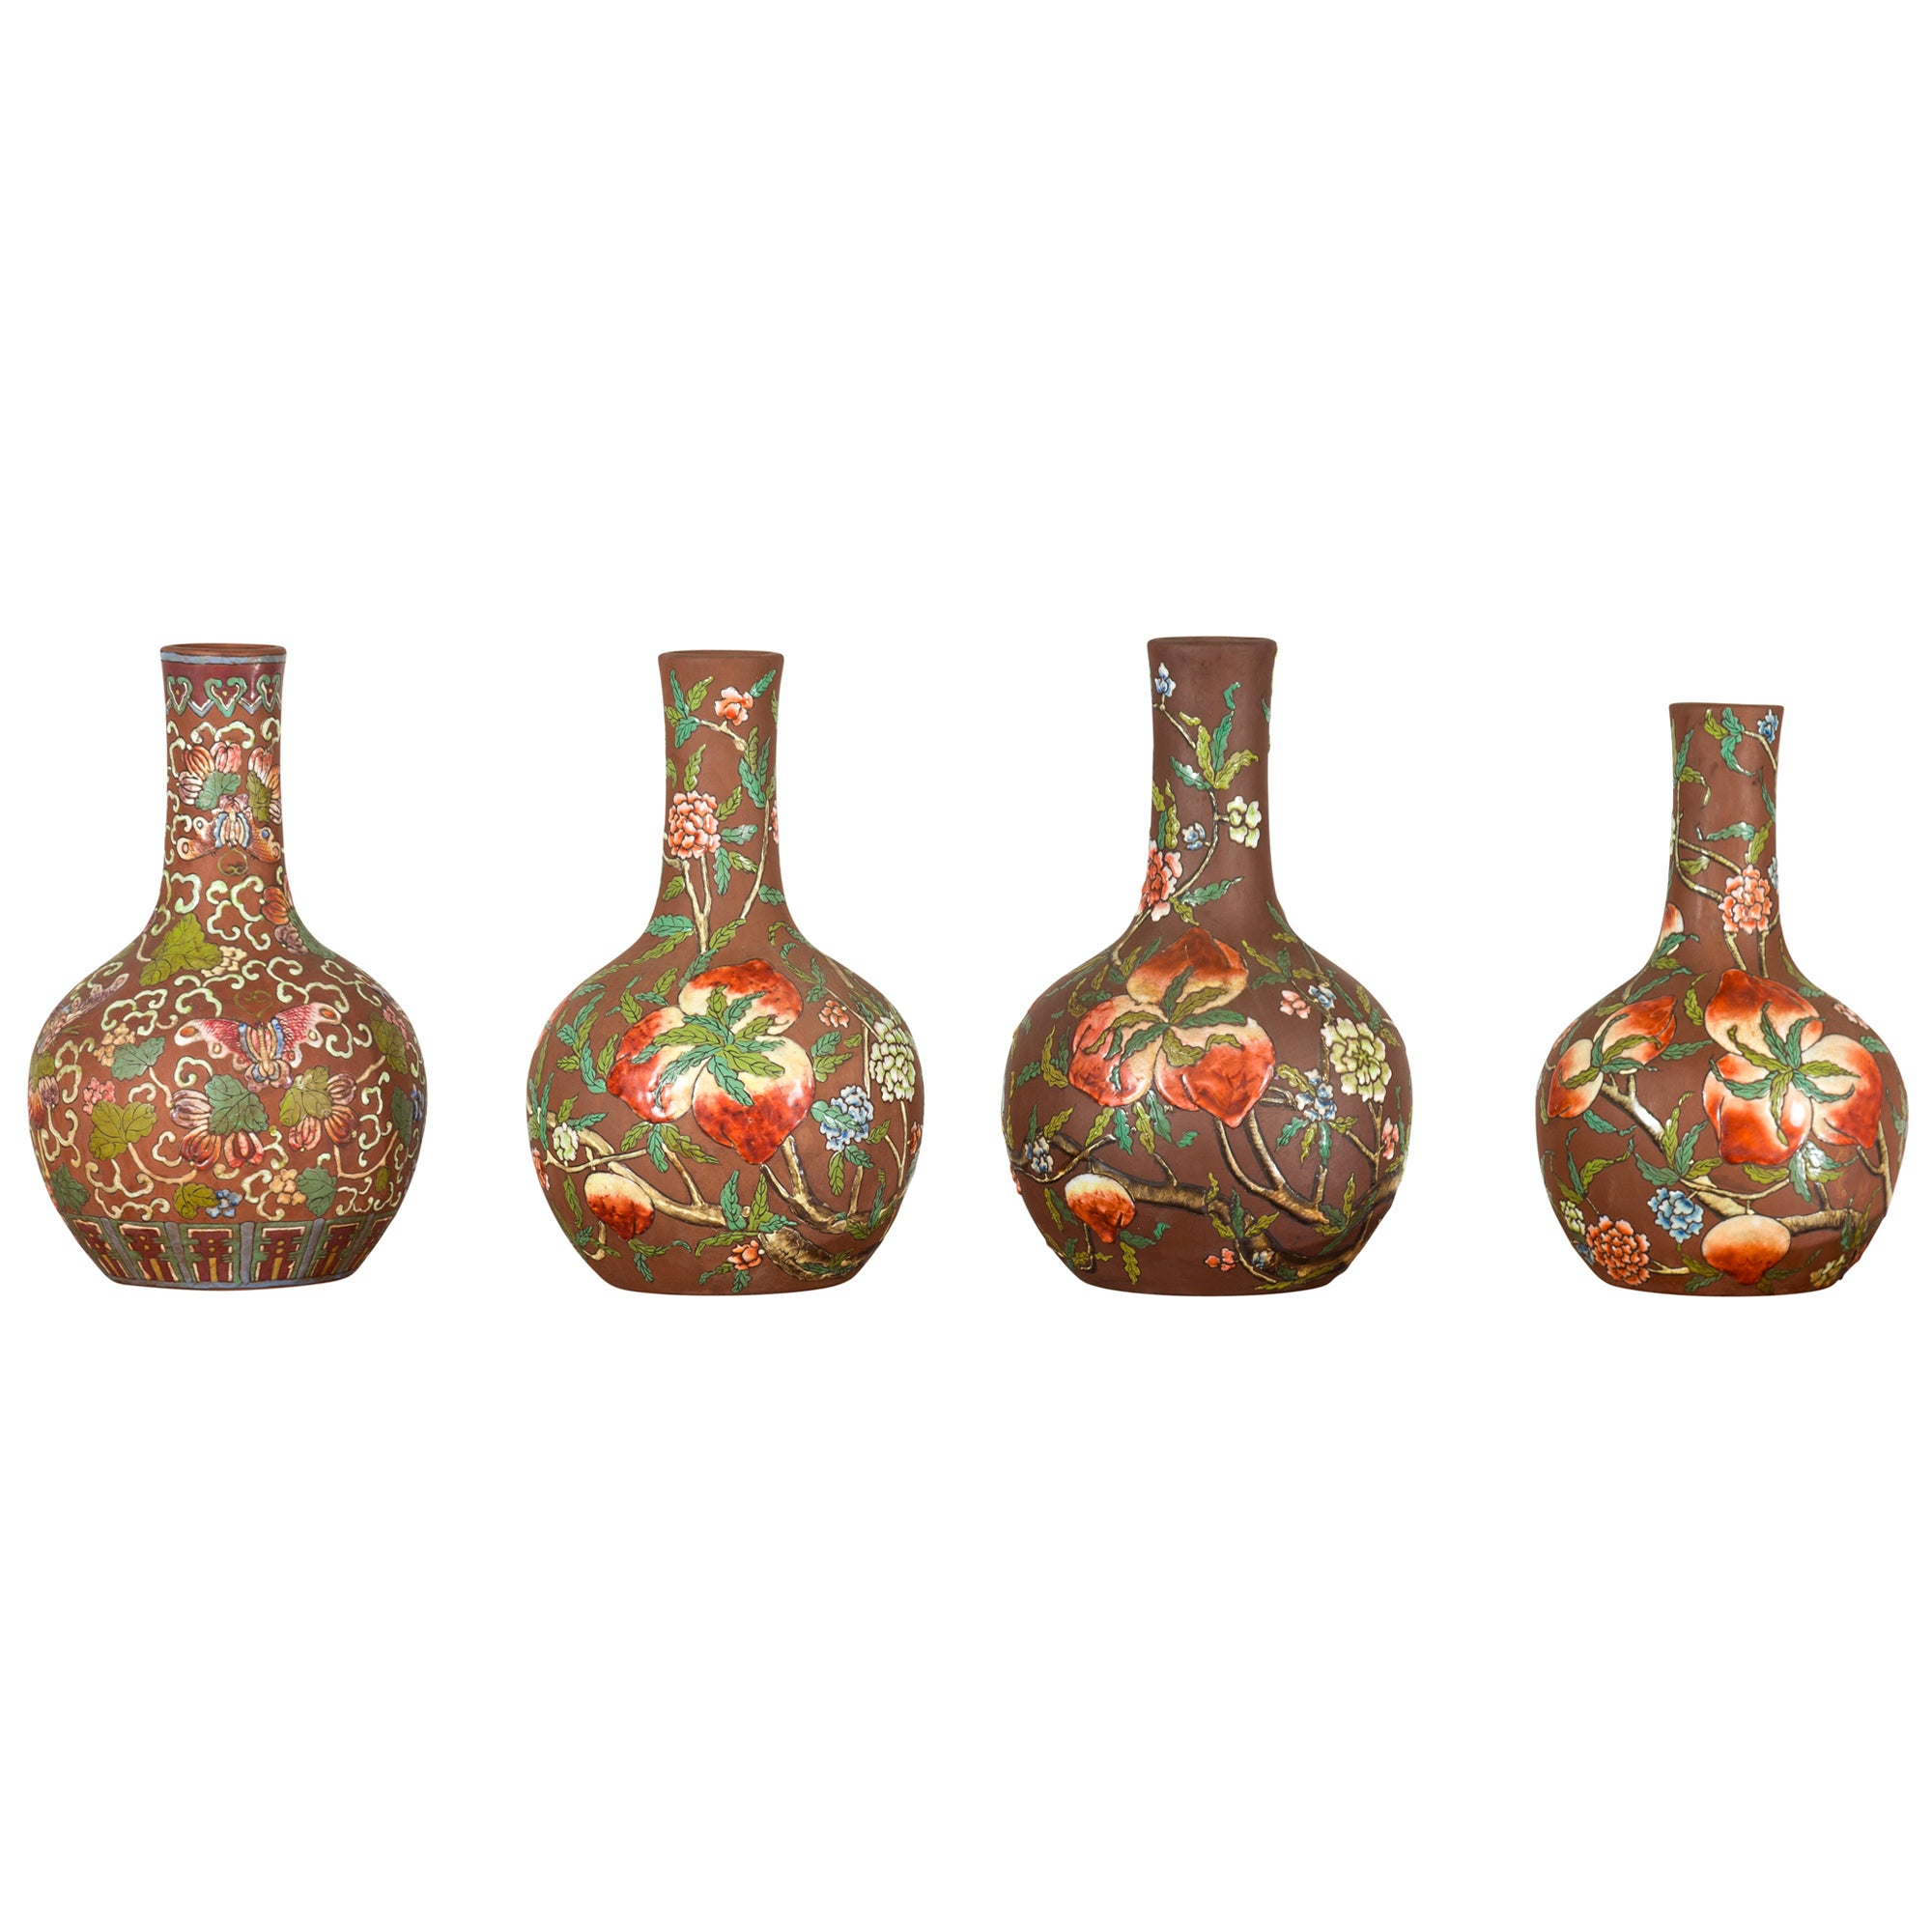 Vintage Chinese Kendi Shape Porcelain Vases with Raised Floral and Fruit Décor